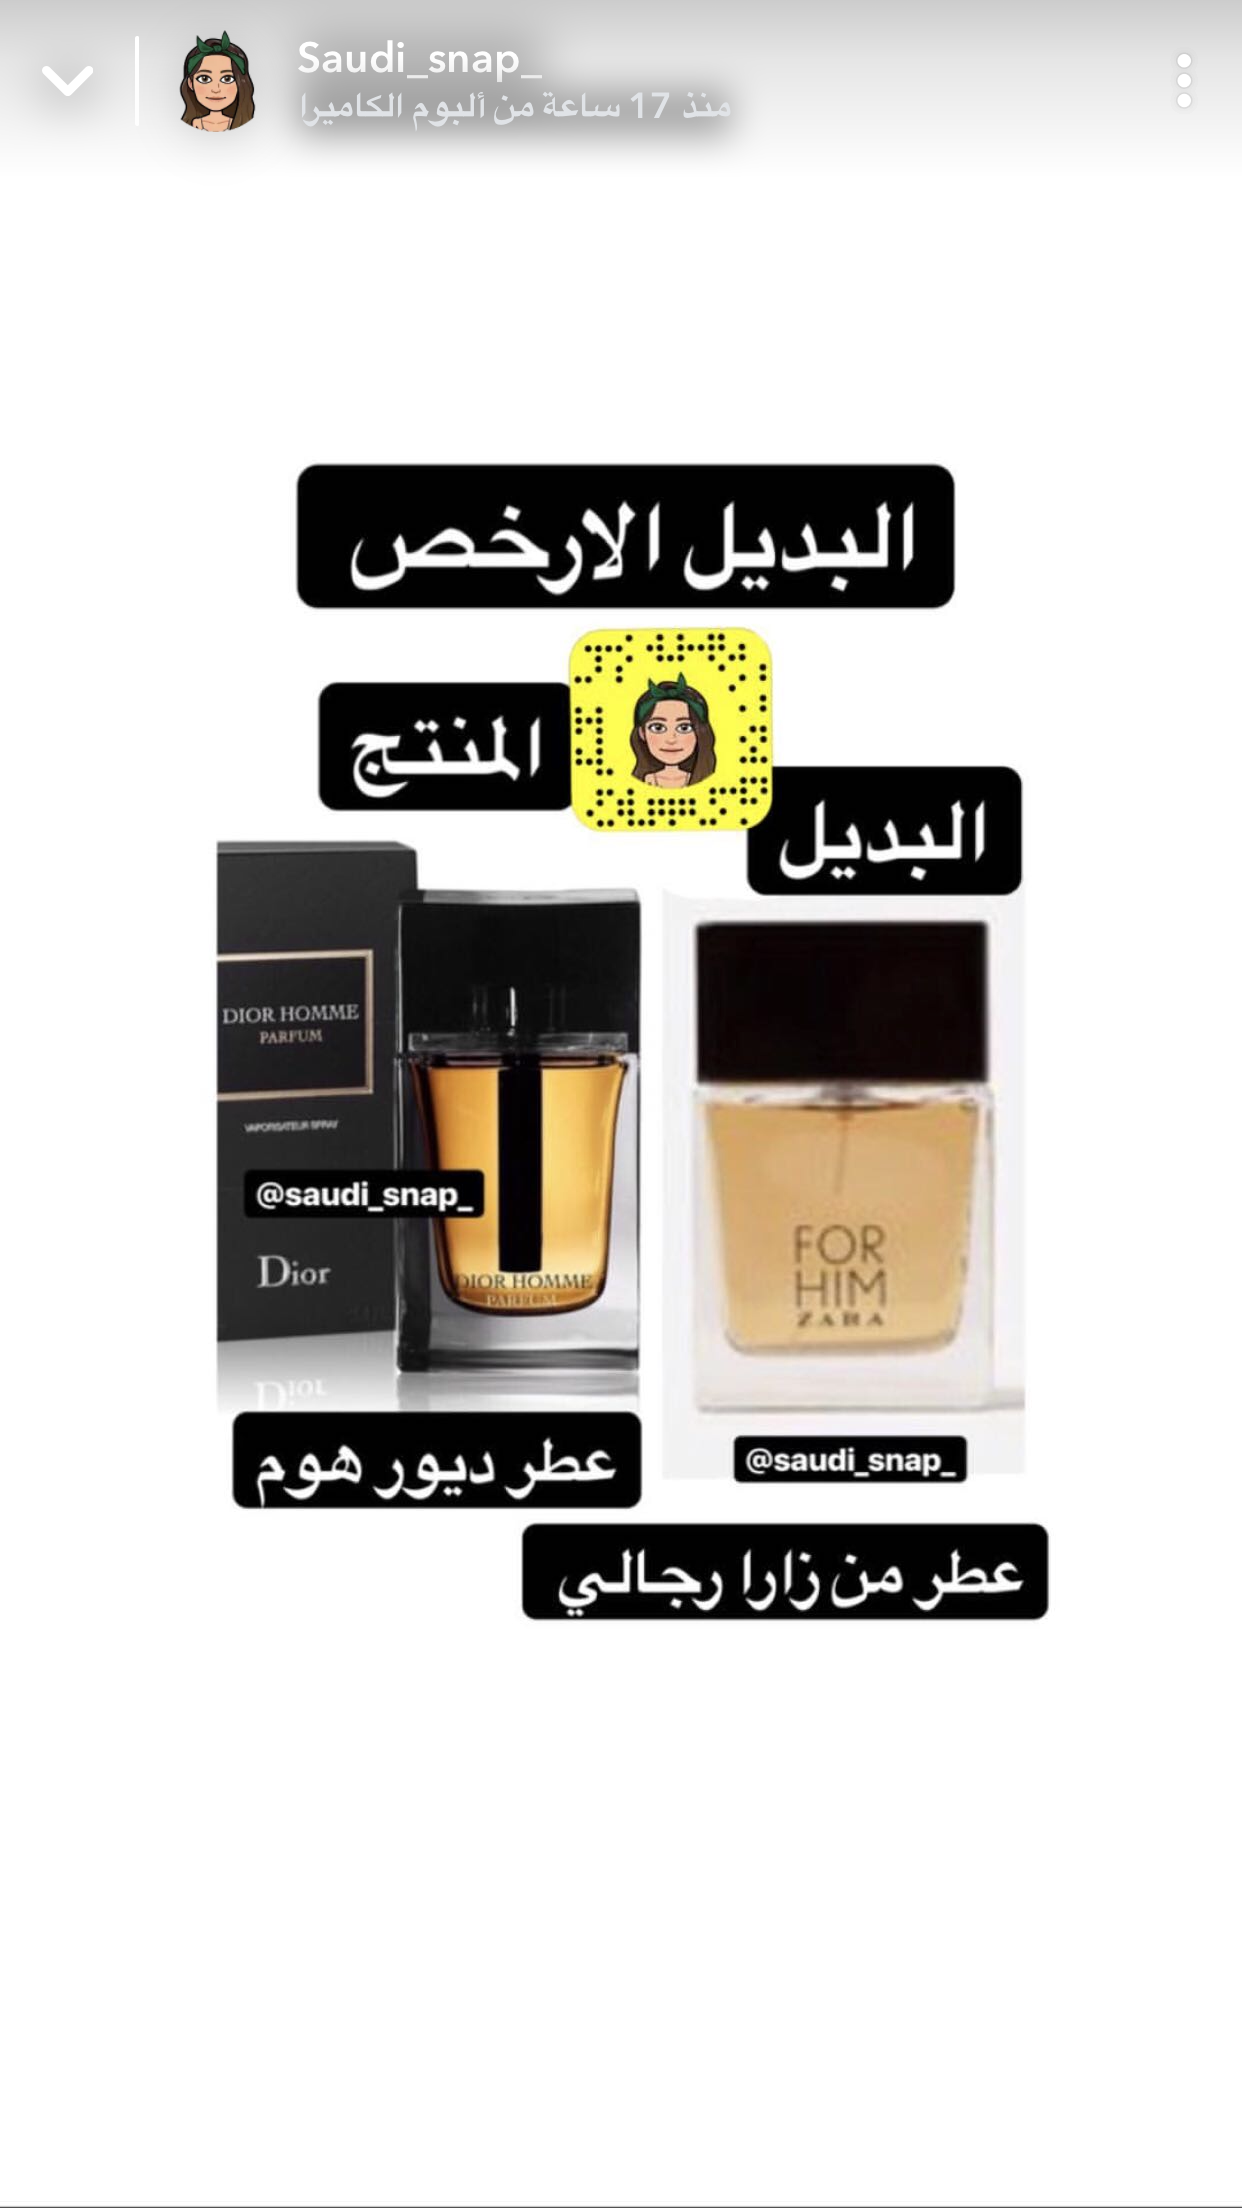 Pin By Maryam On البديل الارخص Lovely Perfume Beauty Perfume Fragrances Perfume